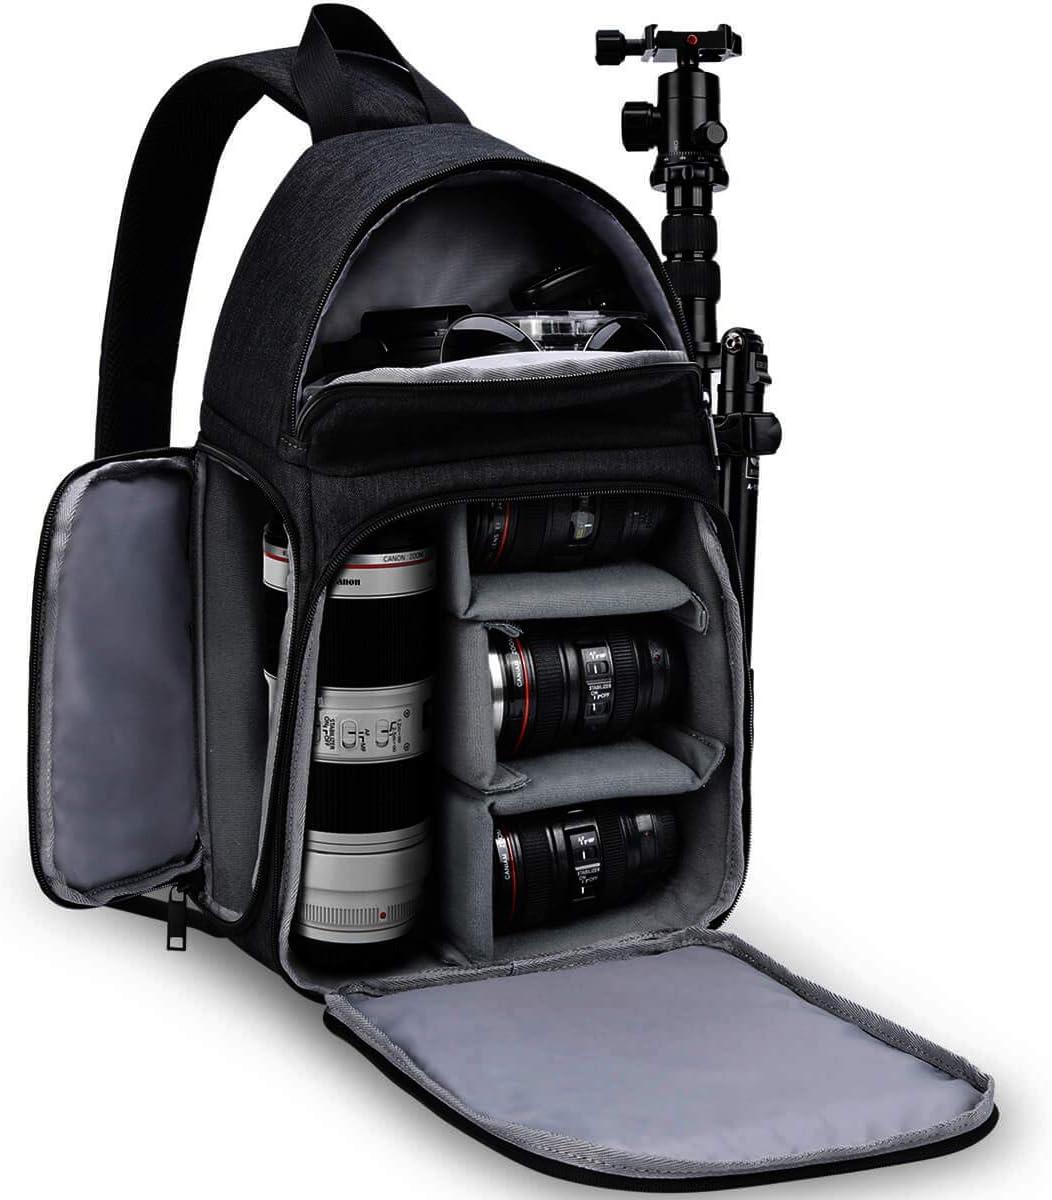 Amazon Com Caden Camera Bag Sling Backpack Camera Case Waterproof With Modular Inserts Tripod Holder For Dslr Slr And Mirrorless Cameras Canon Nikon Sony Pentax Black Camera Photo